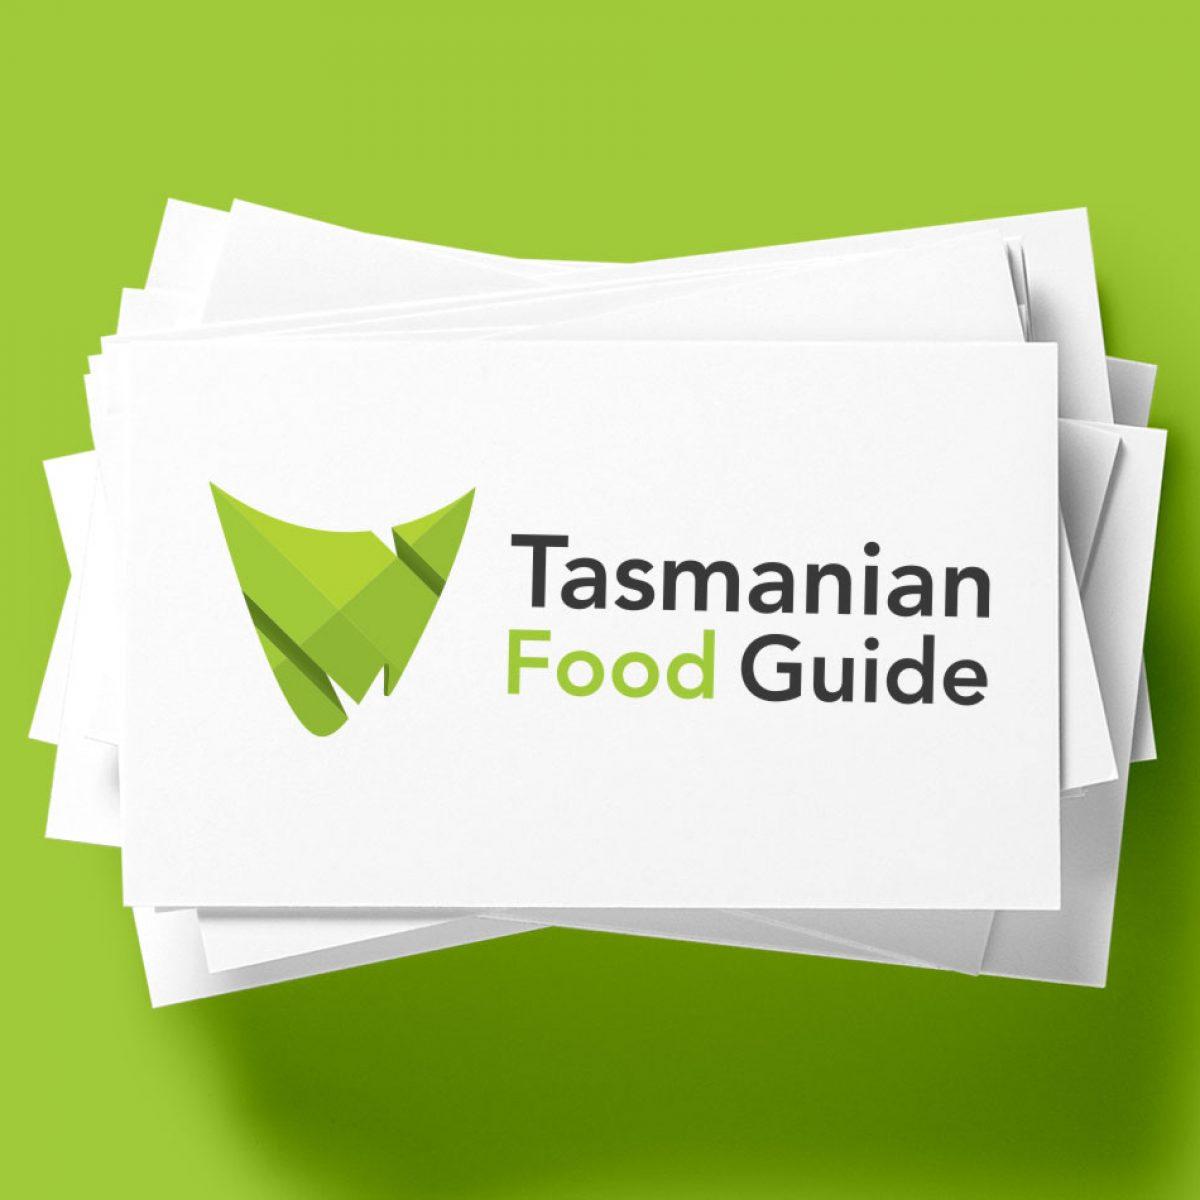 Tasmanian Food Guide Logo Design